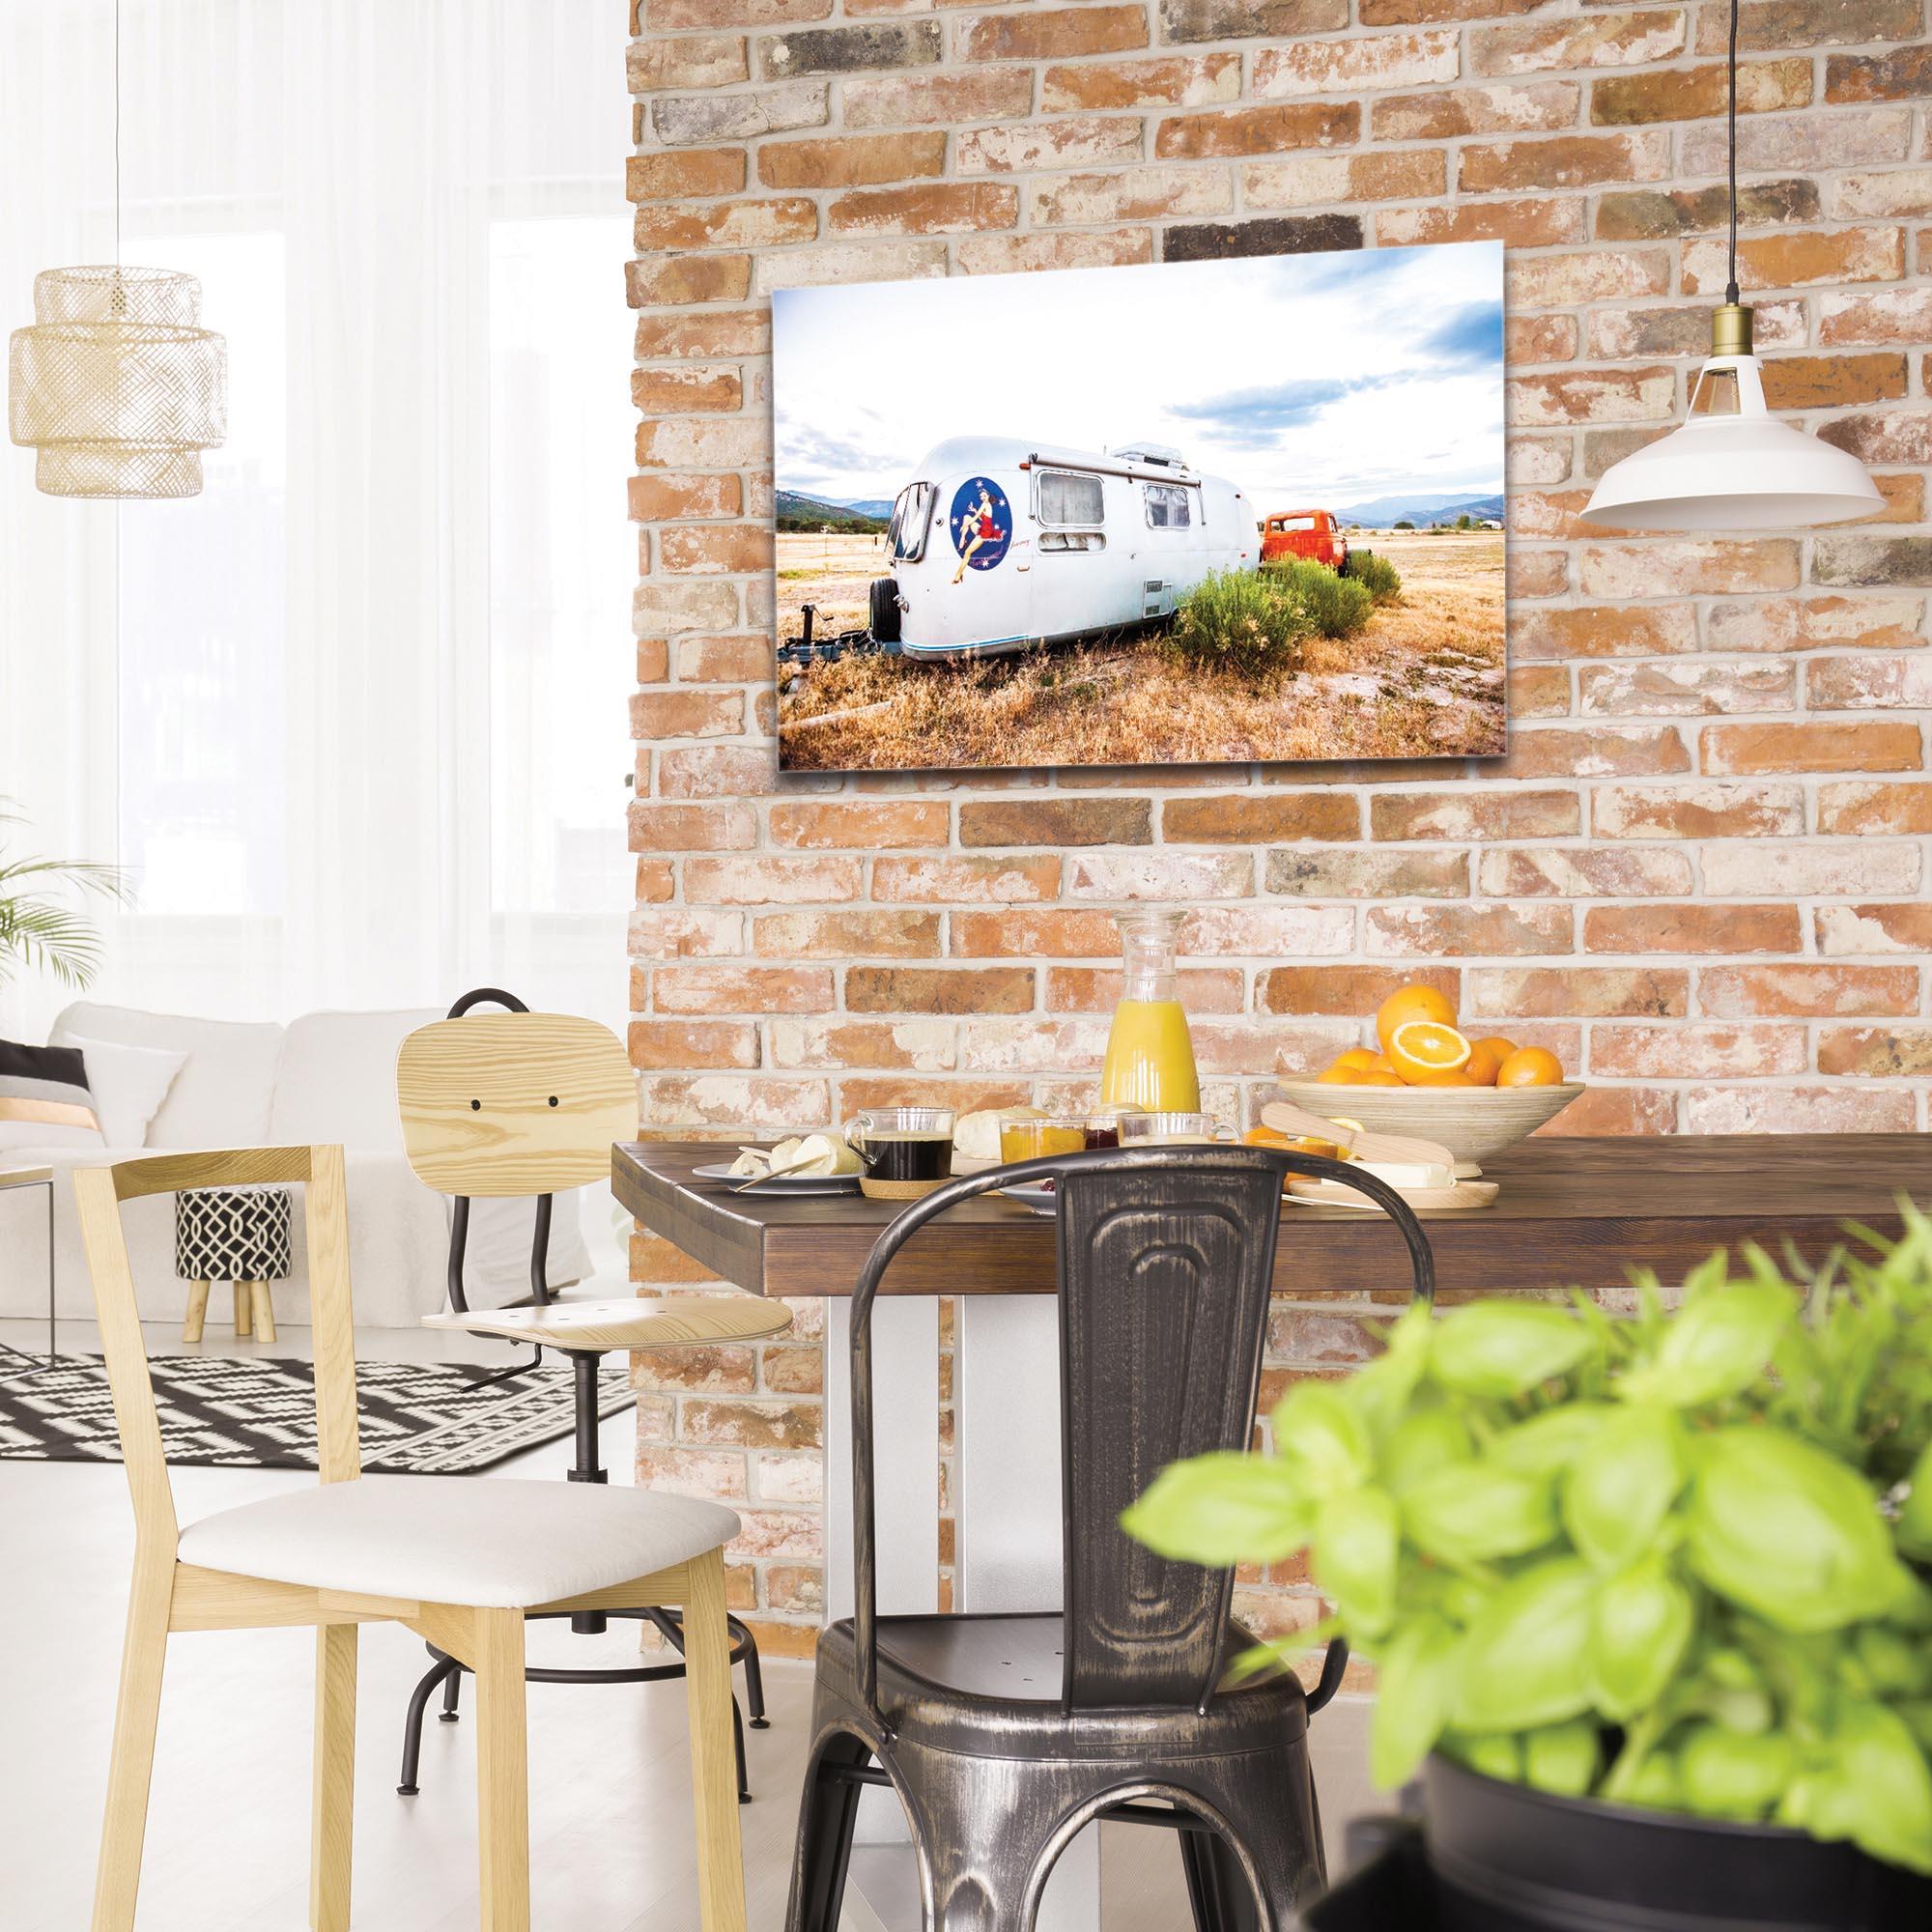 Americana Wall Art 'Airstream Lady' - Classic Cars Decor on Metal or Plexiglass - Image 3